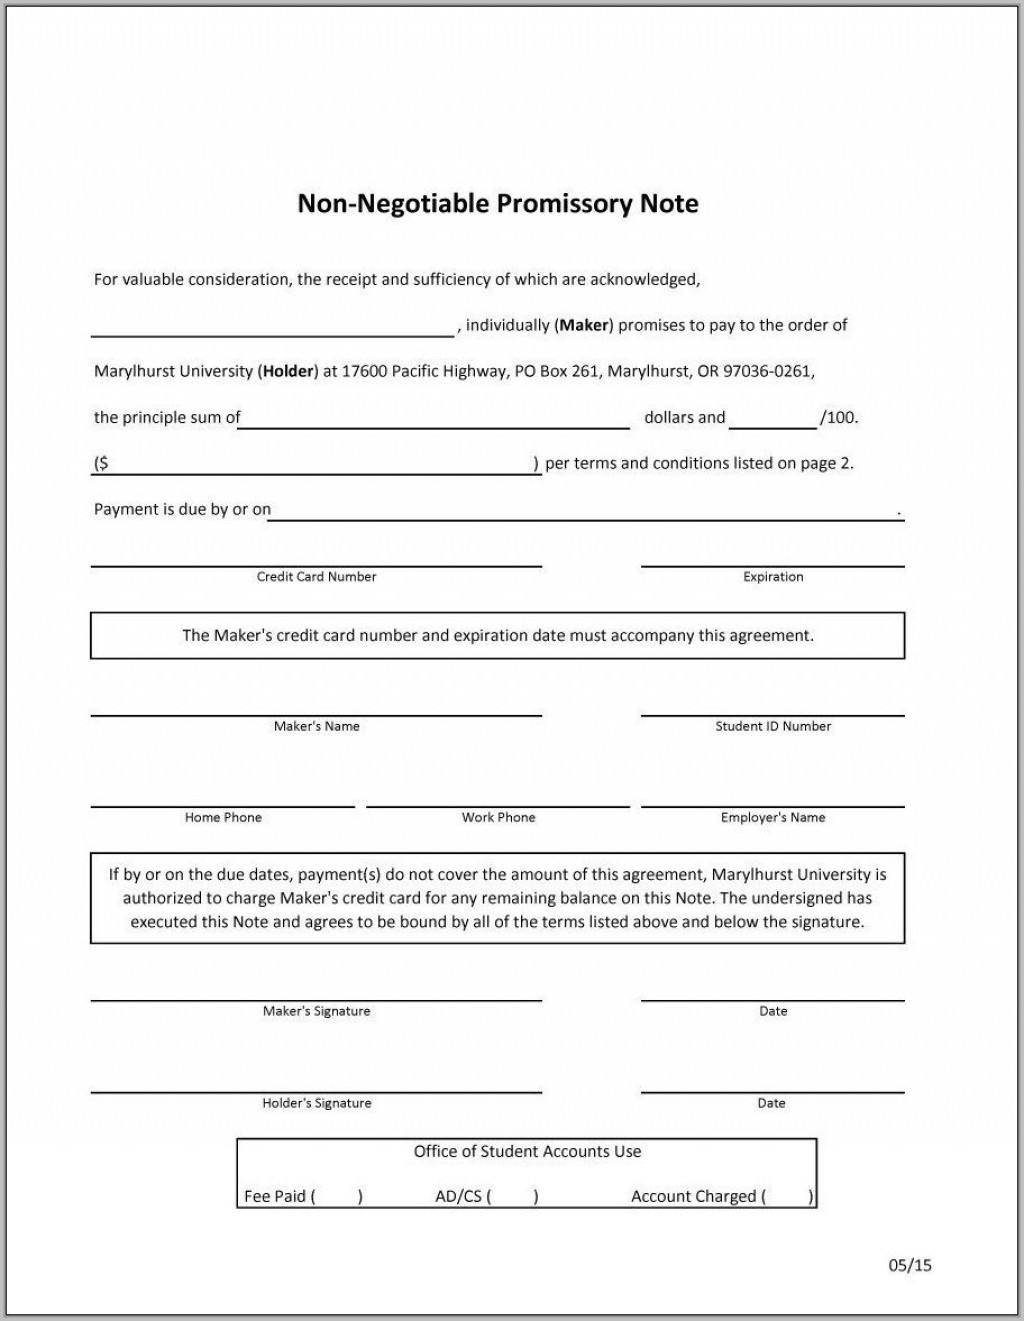 002 Impressive Promissory Note Template Free Image  Pdf Florida Blank FormLarge